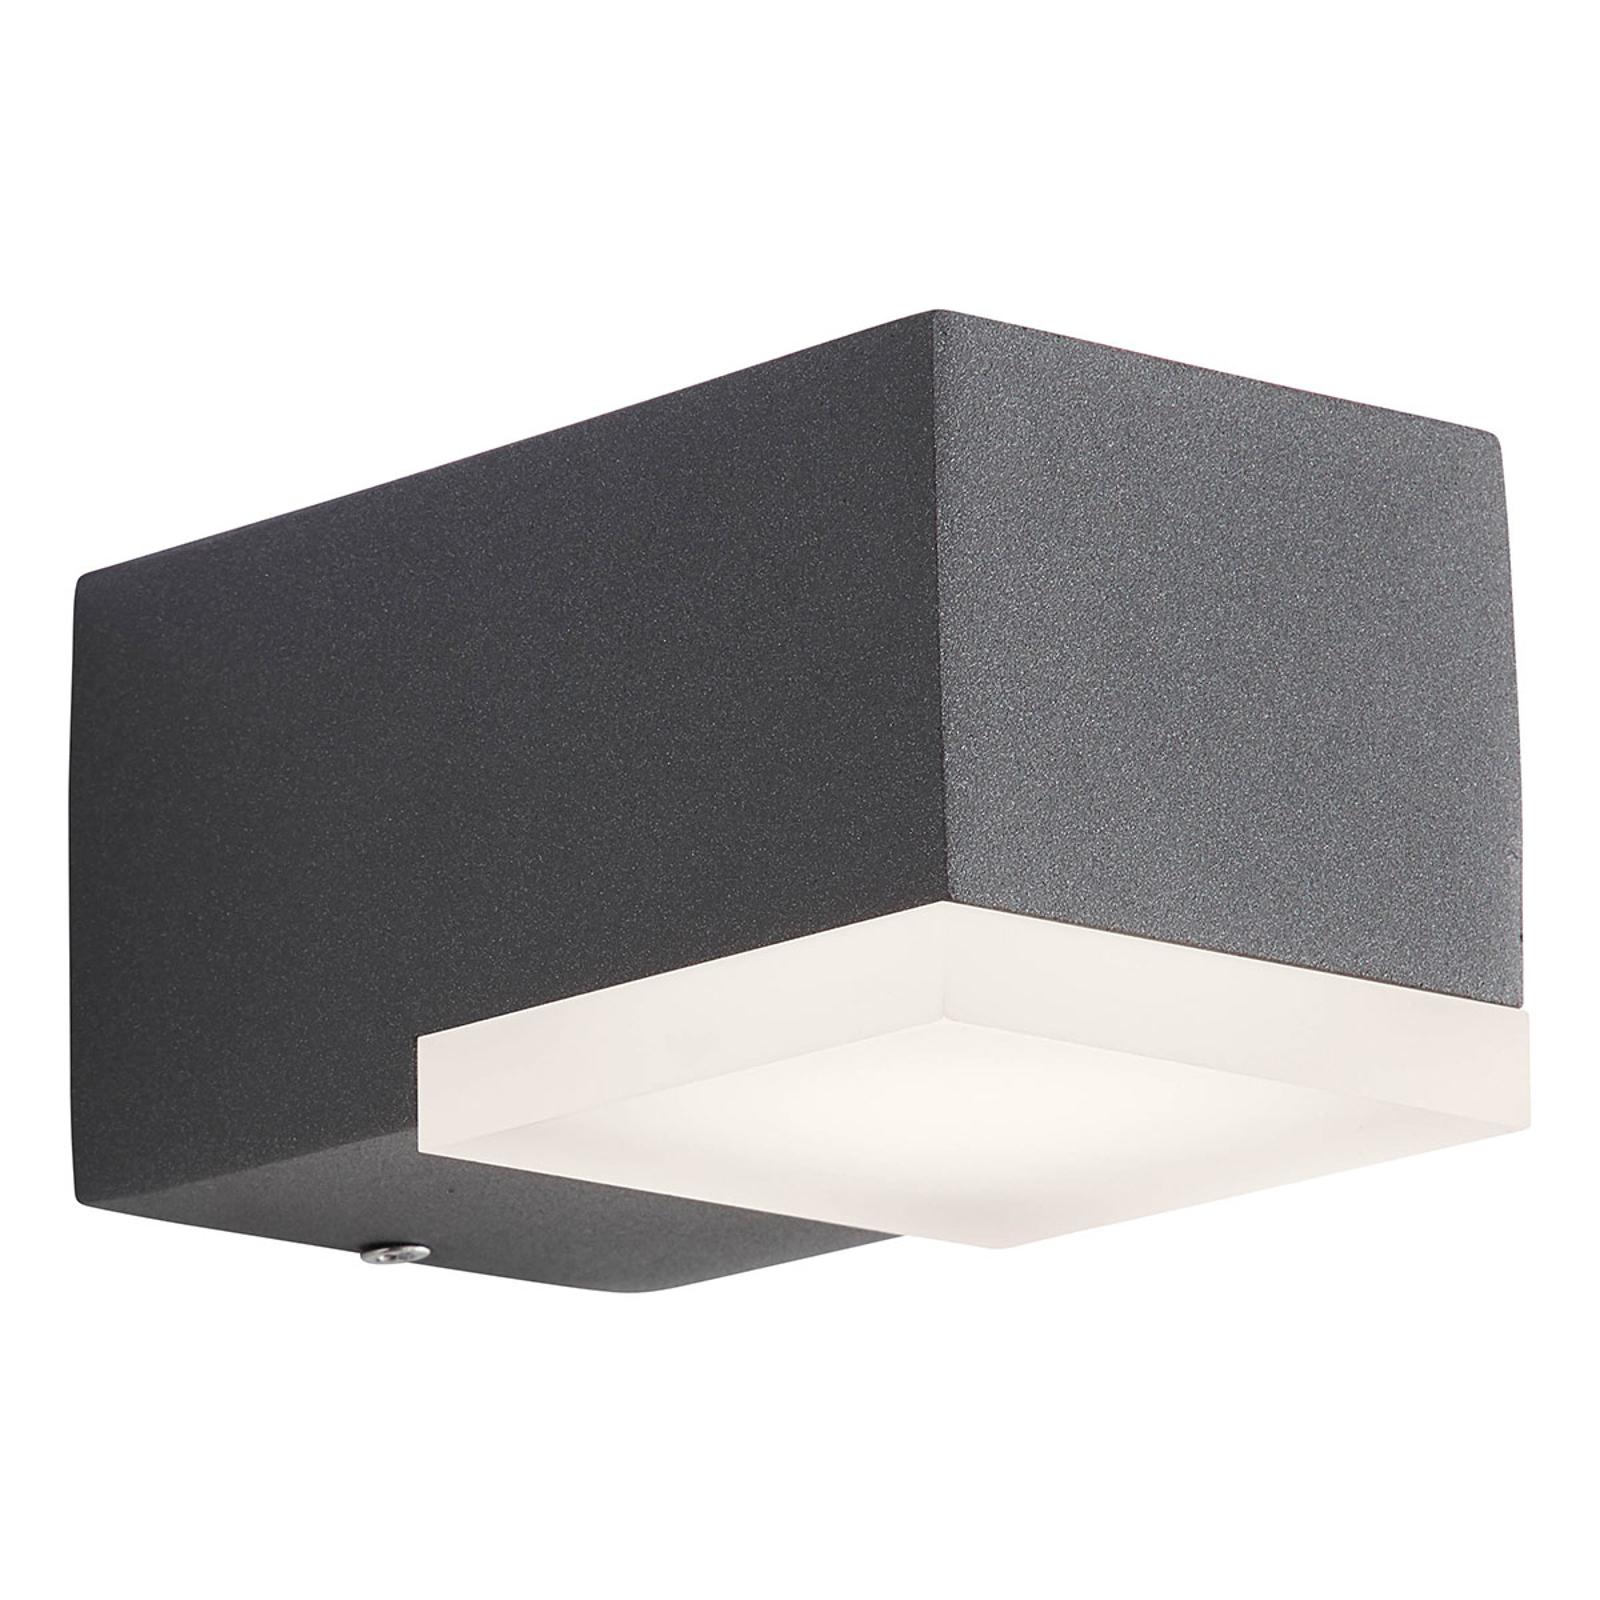 AEG Amity LED buitenwandlamp, 1-lamp